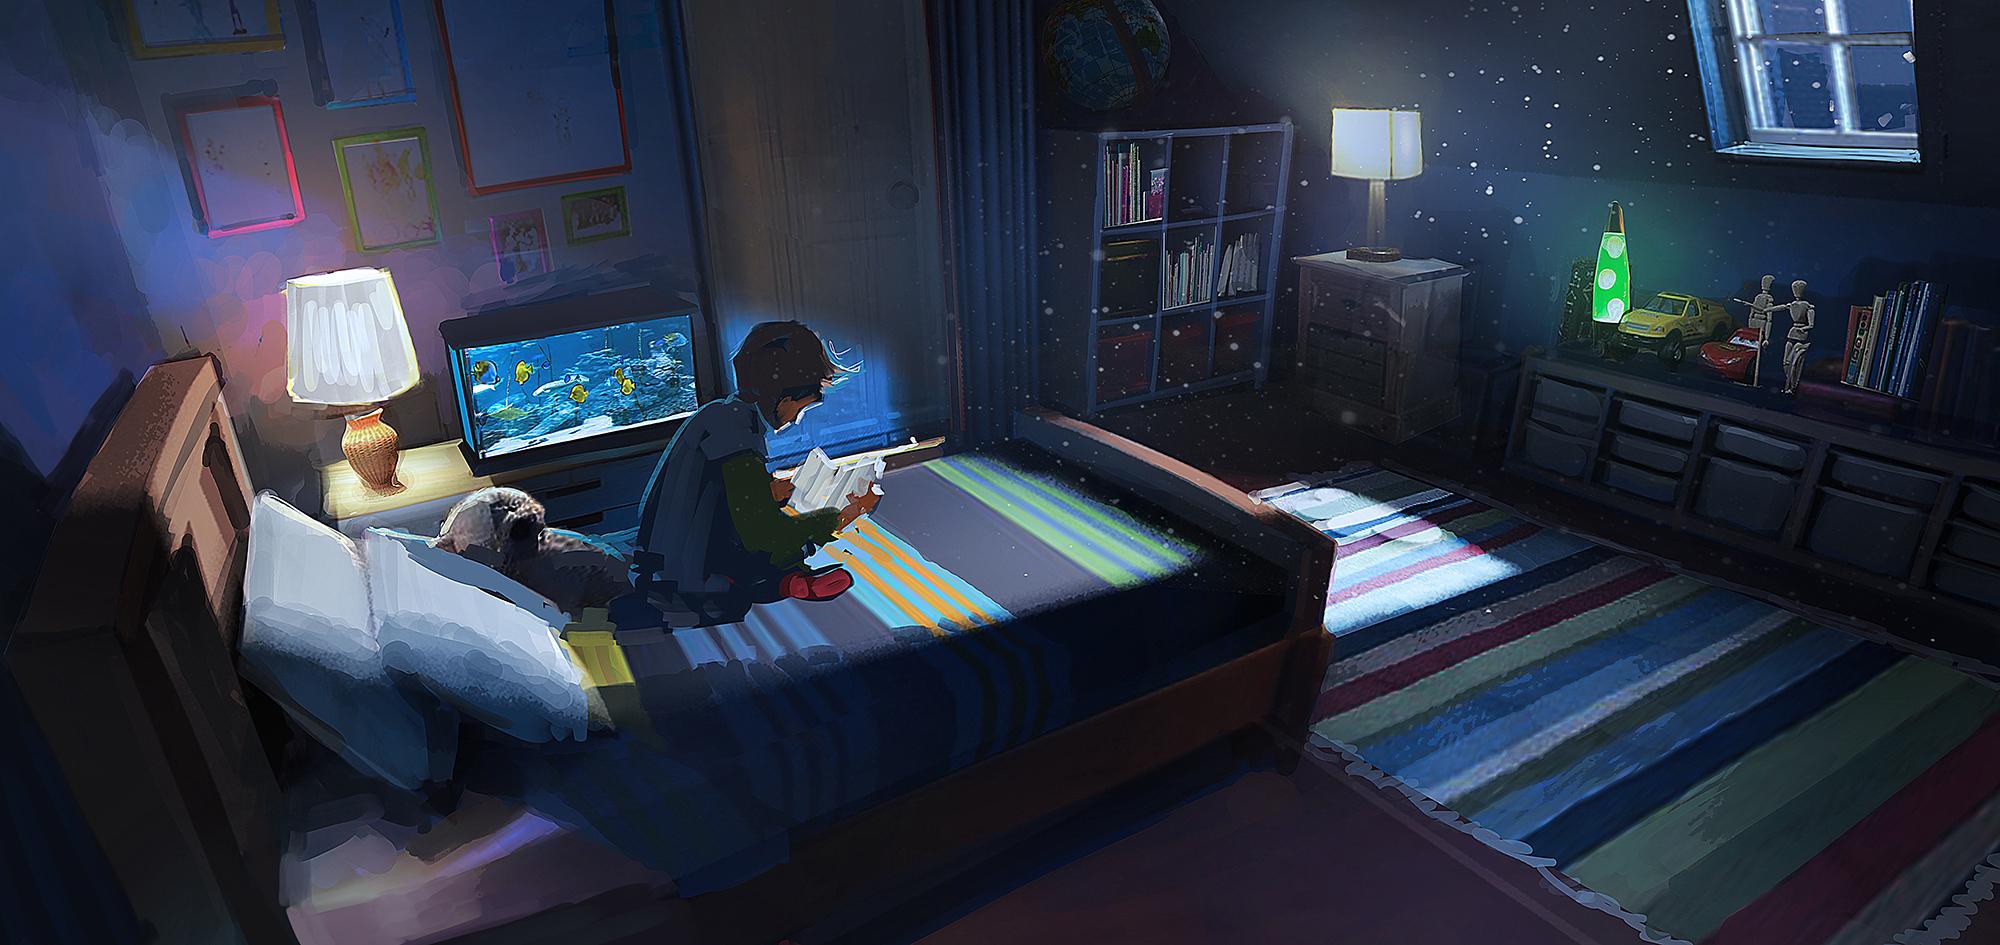 Night Room by RhysGriffiths